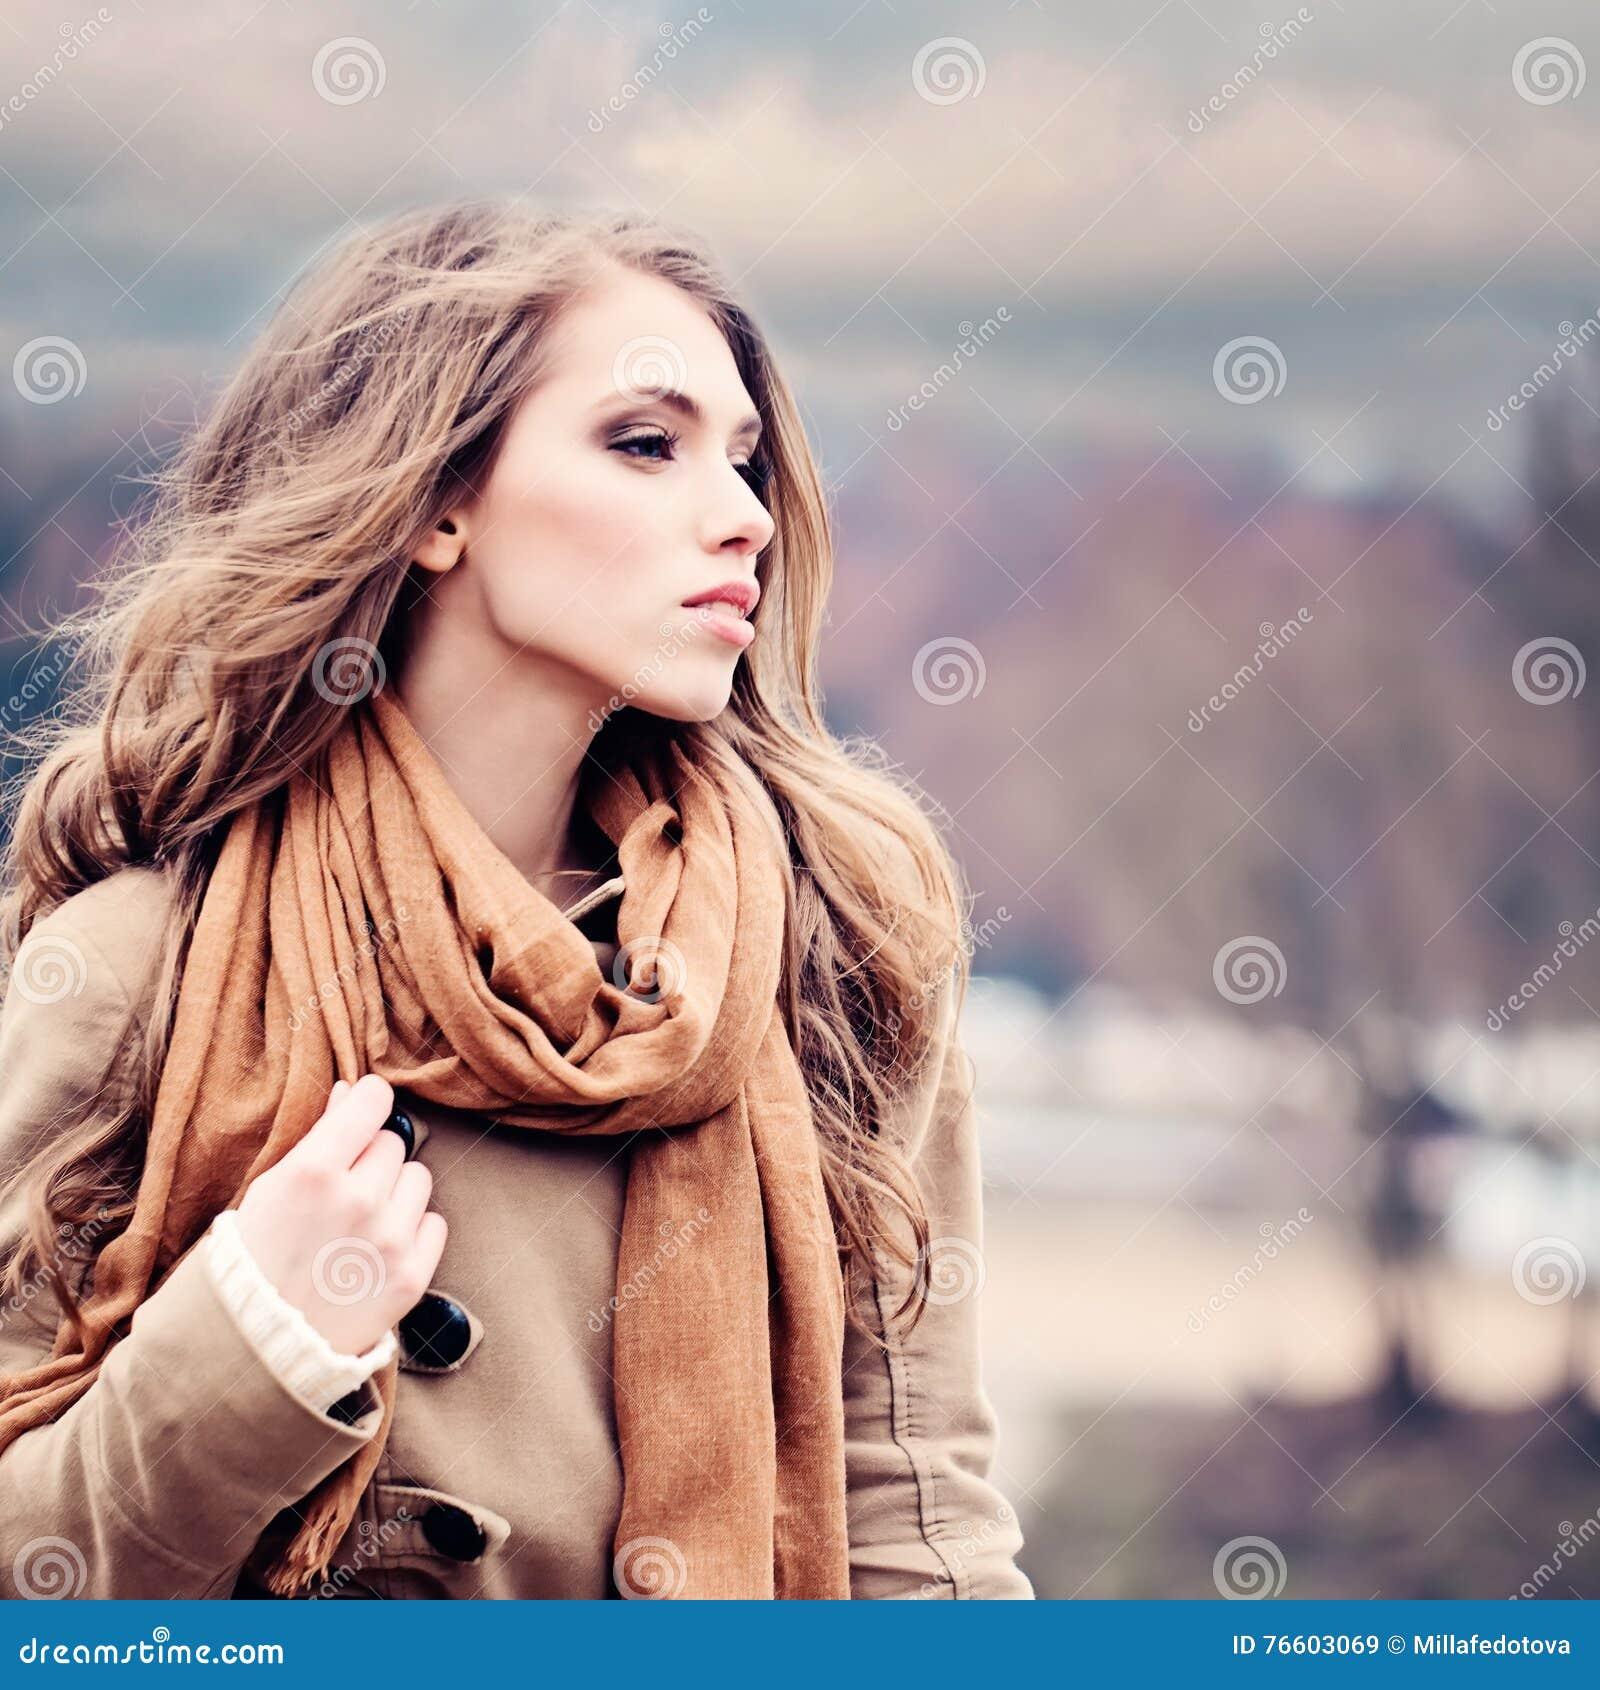 Fashion Model Woman Outdoors